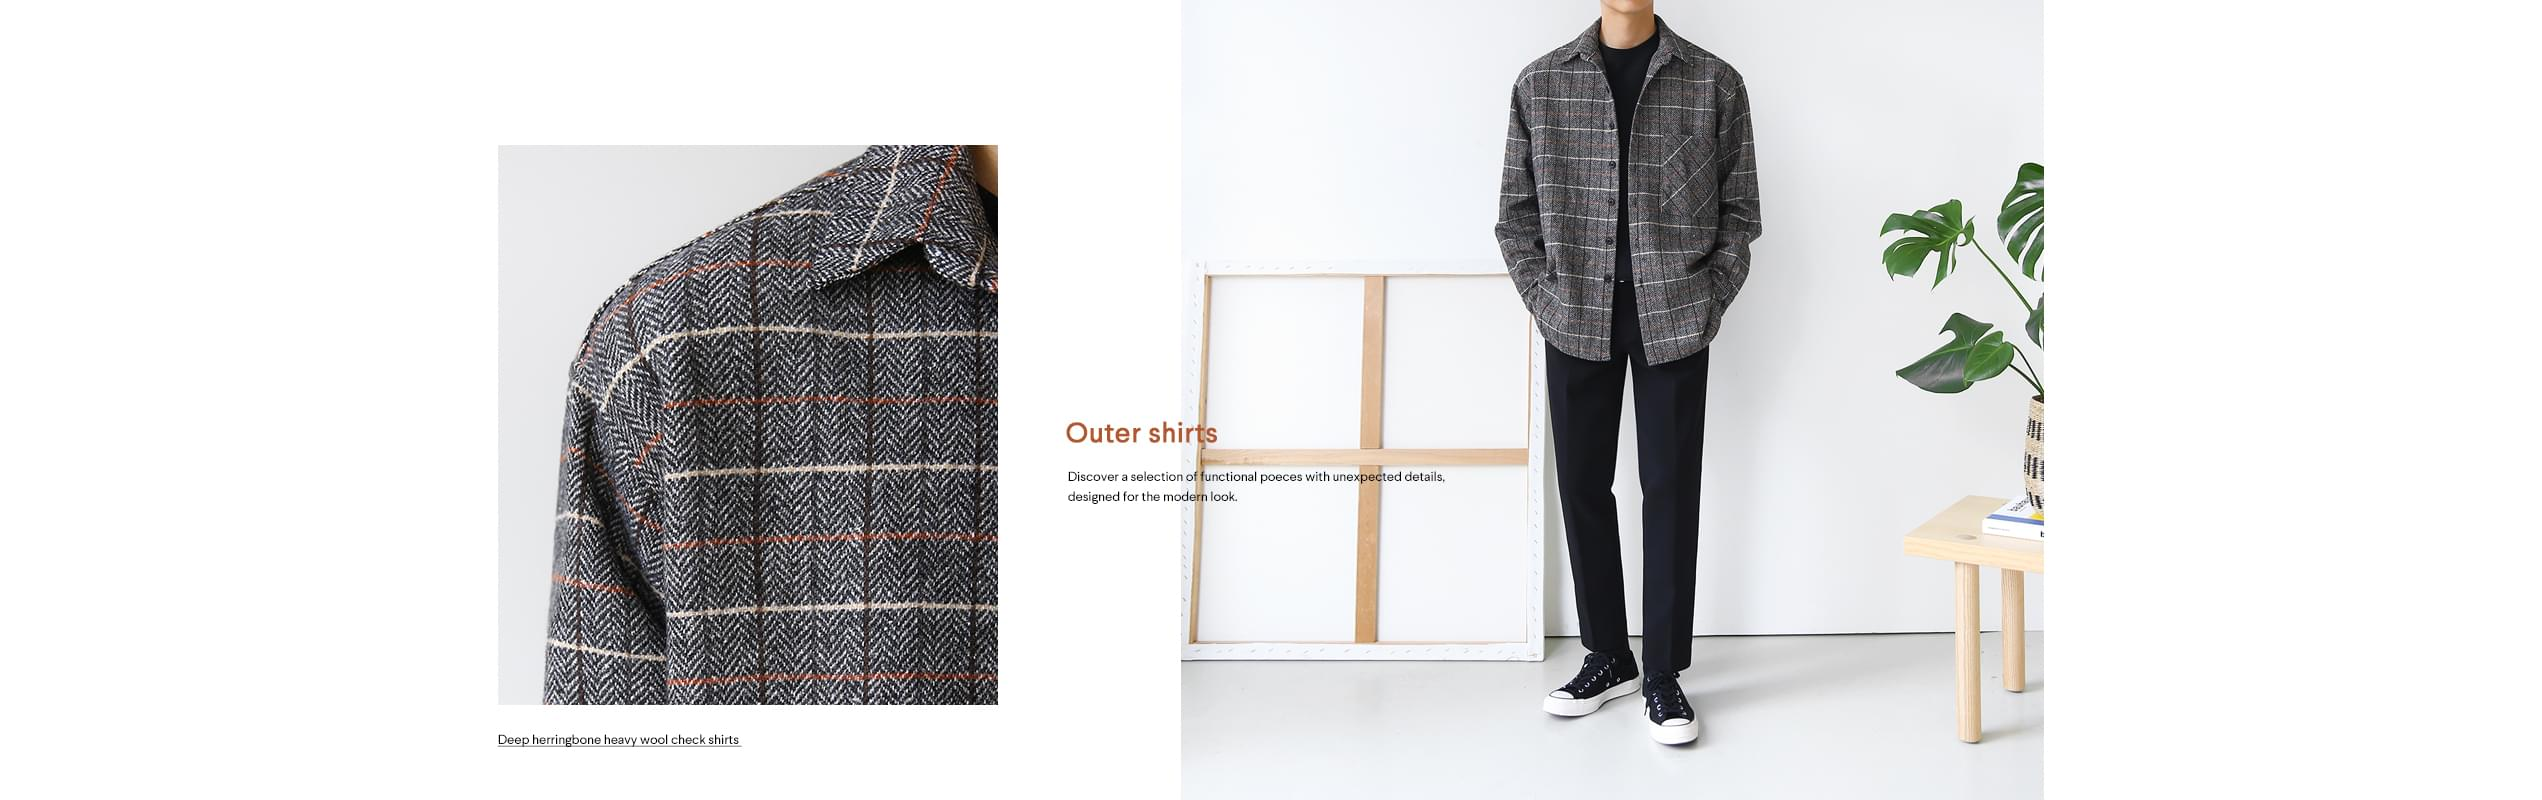 Deep Herringbone Heavy Wool Check Shirt